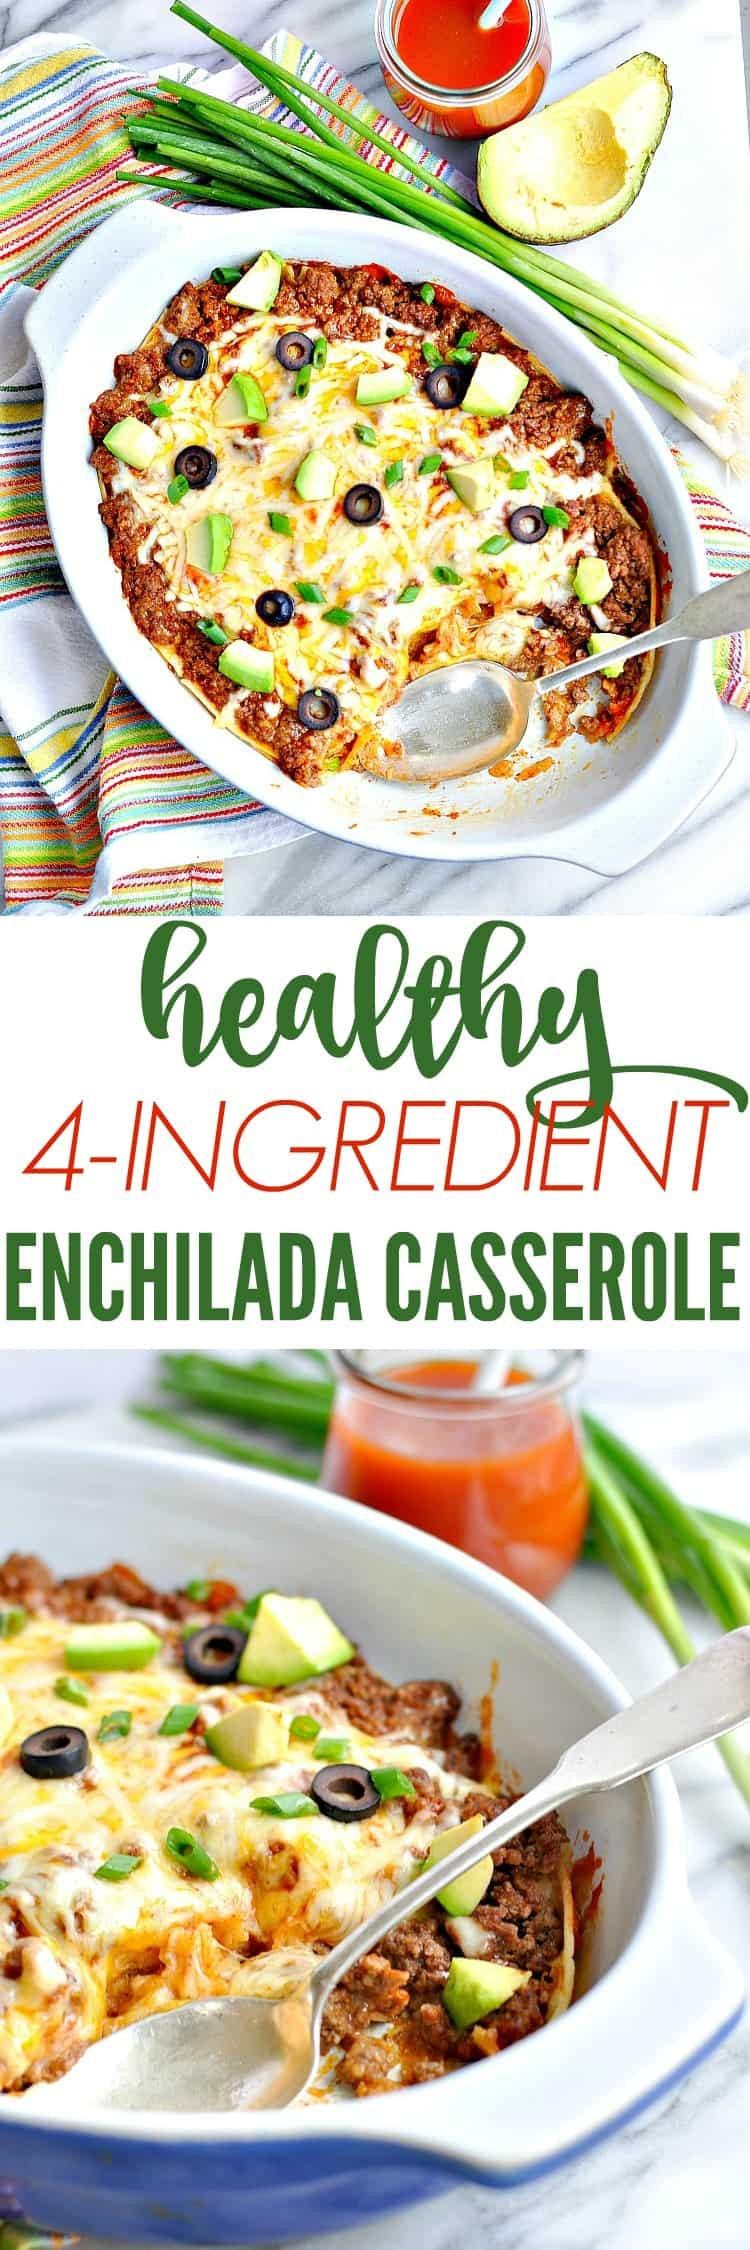 Healthy Chicken Enchilada Casserole  Healthy 4 Ingre nt Enchilada Casserole The Seasoned Mom